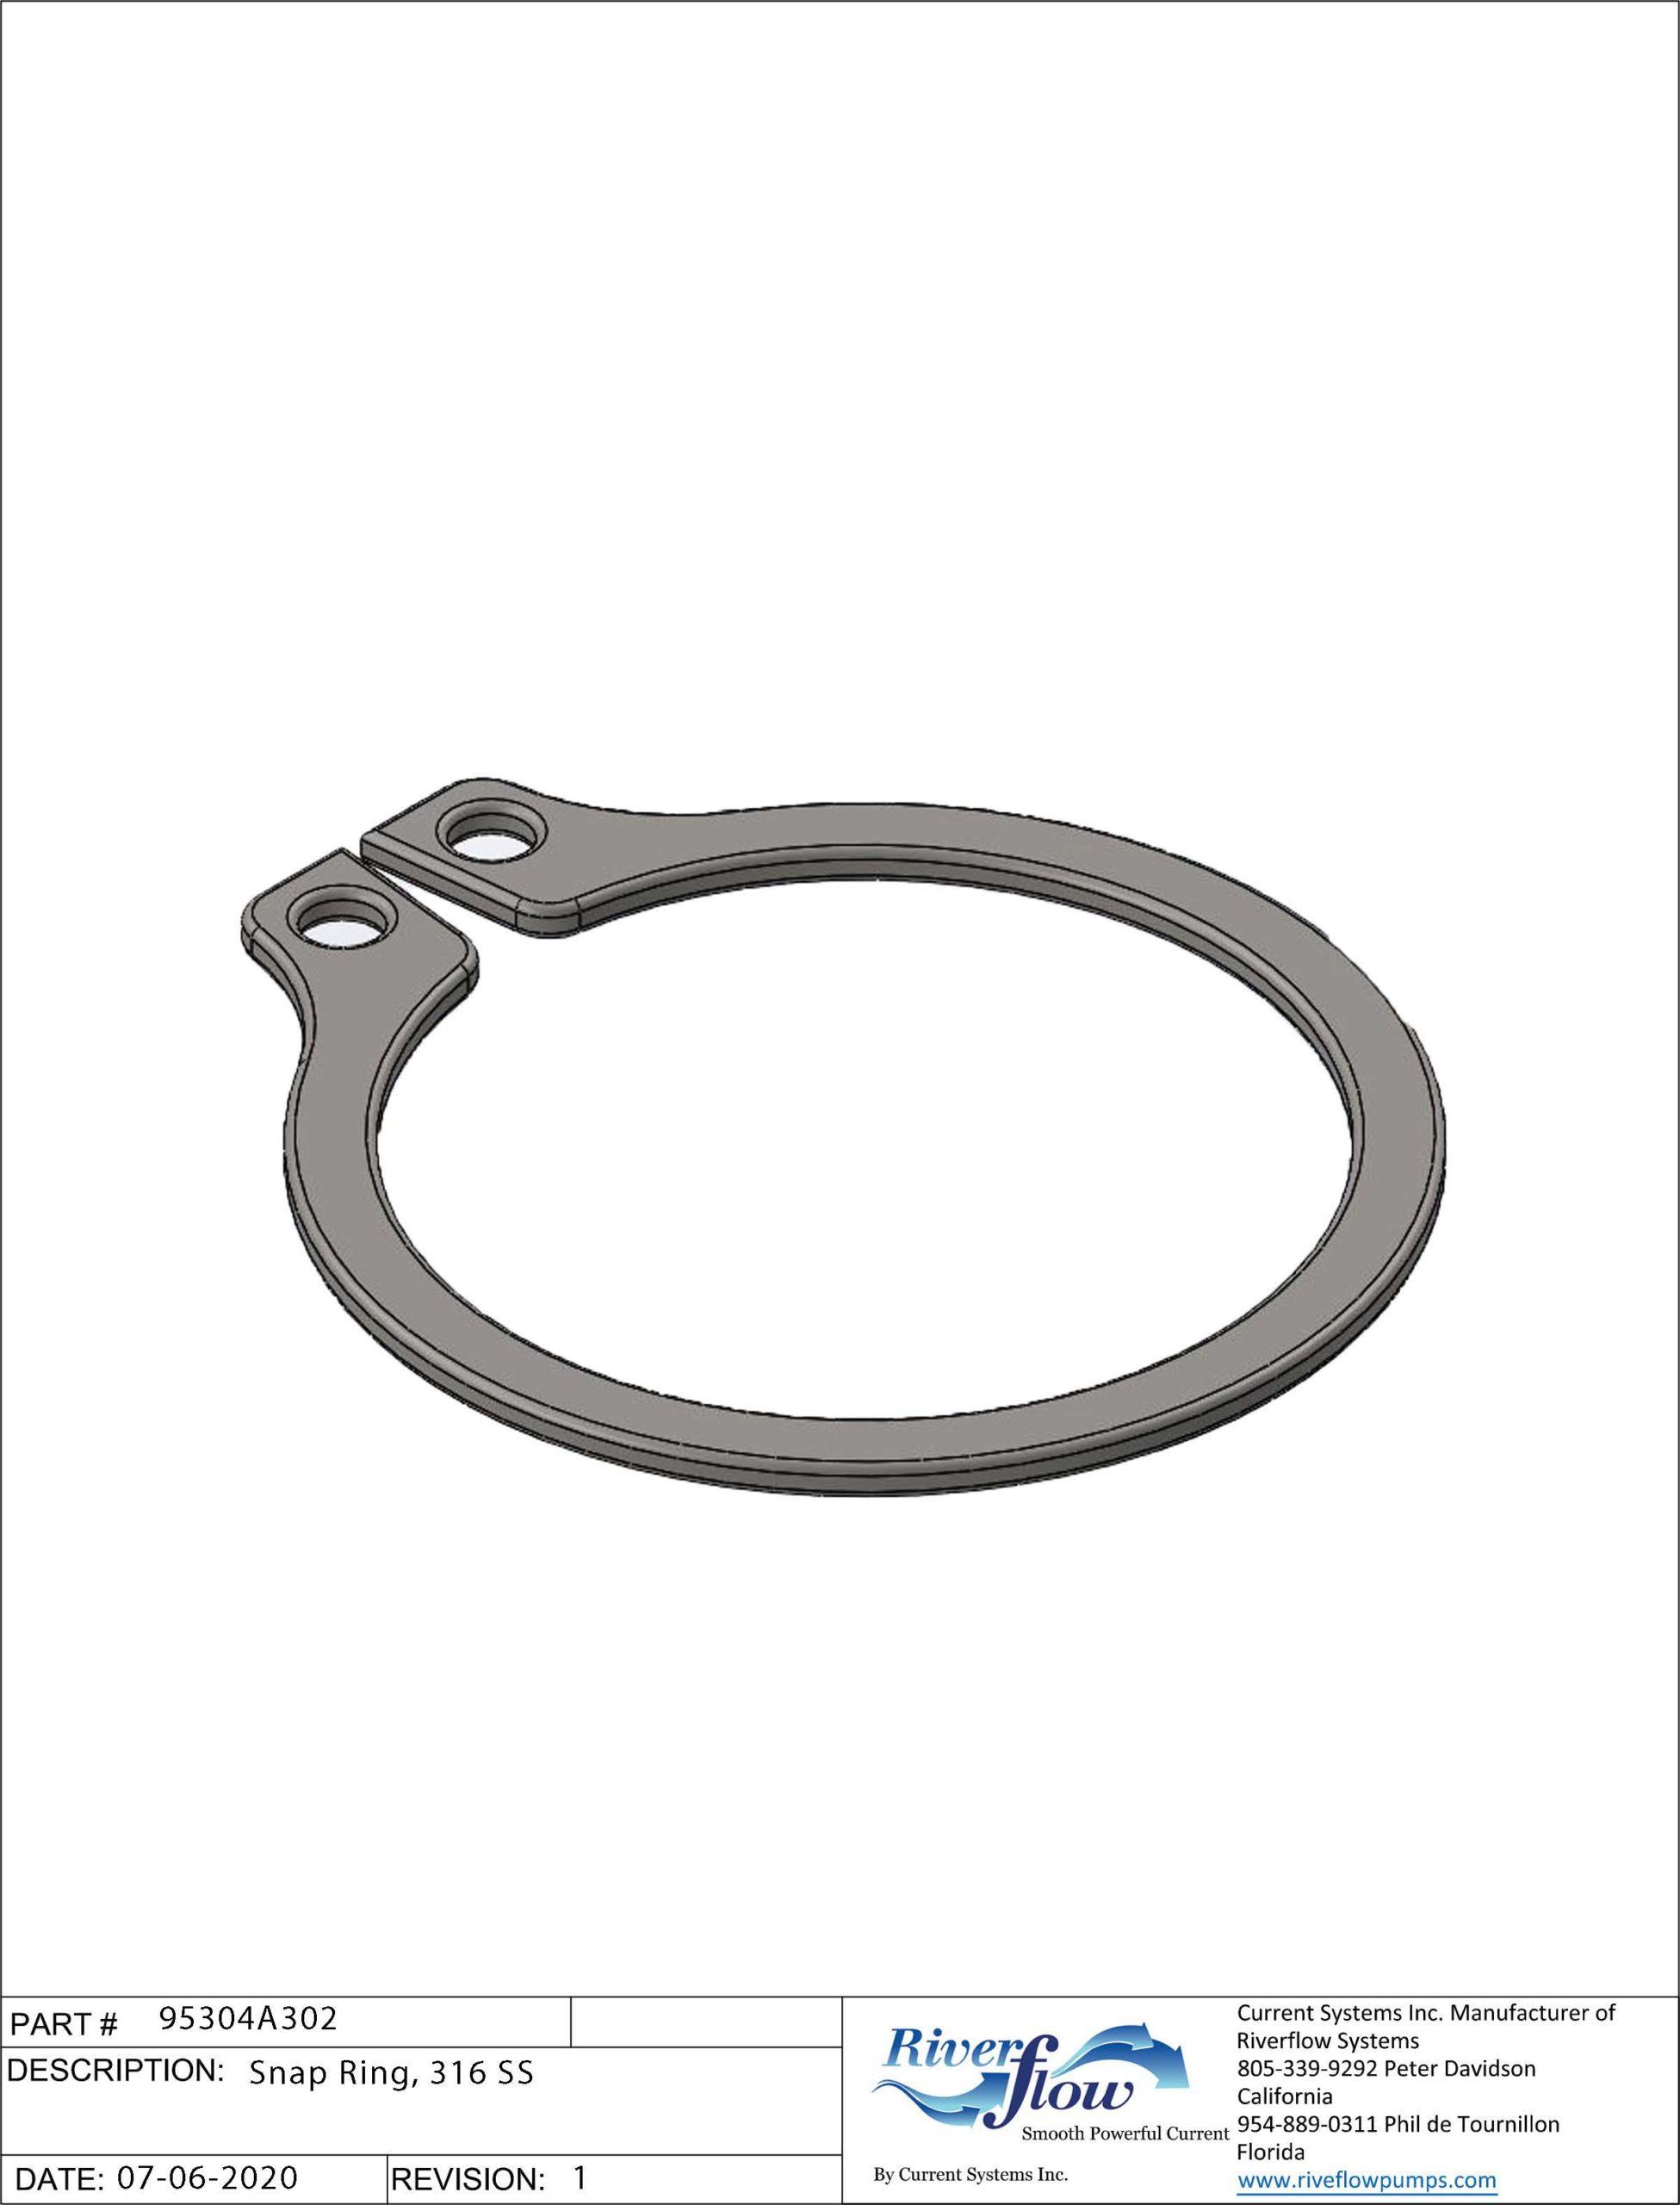 PN#: 95304A302  Snap Ring, 316 SS